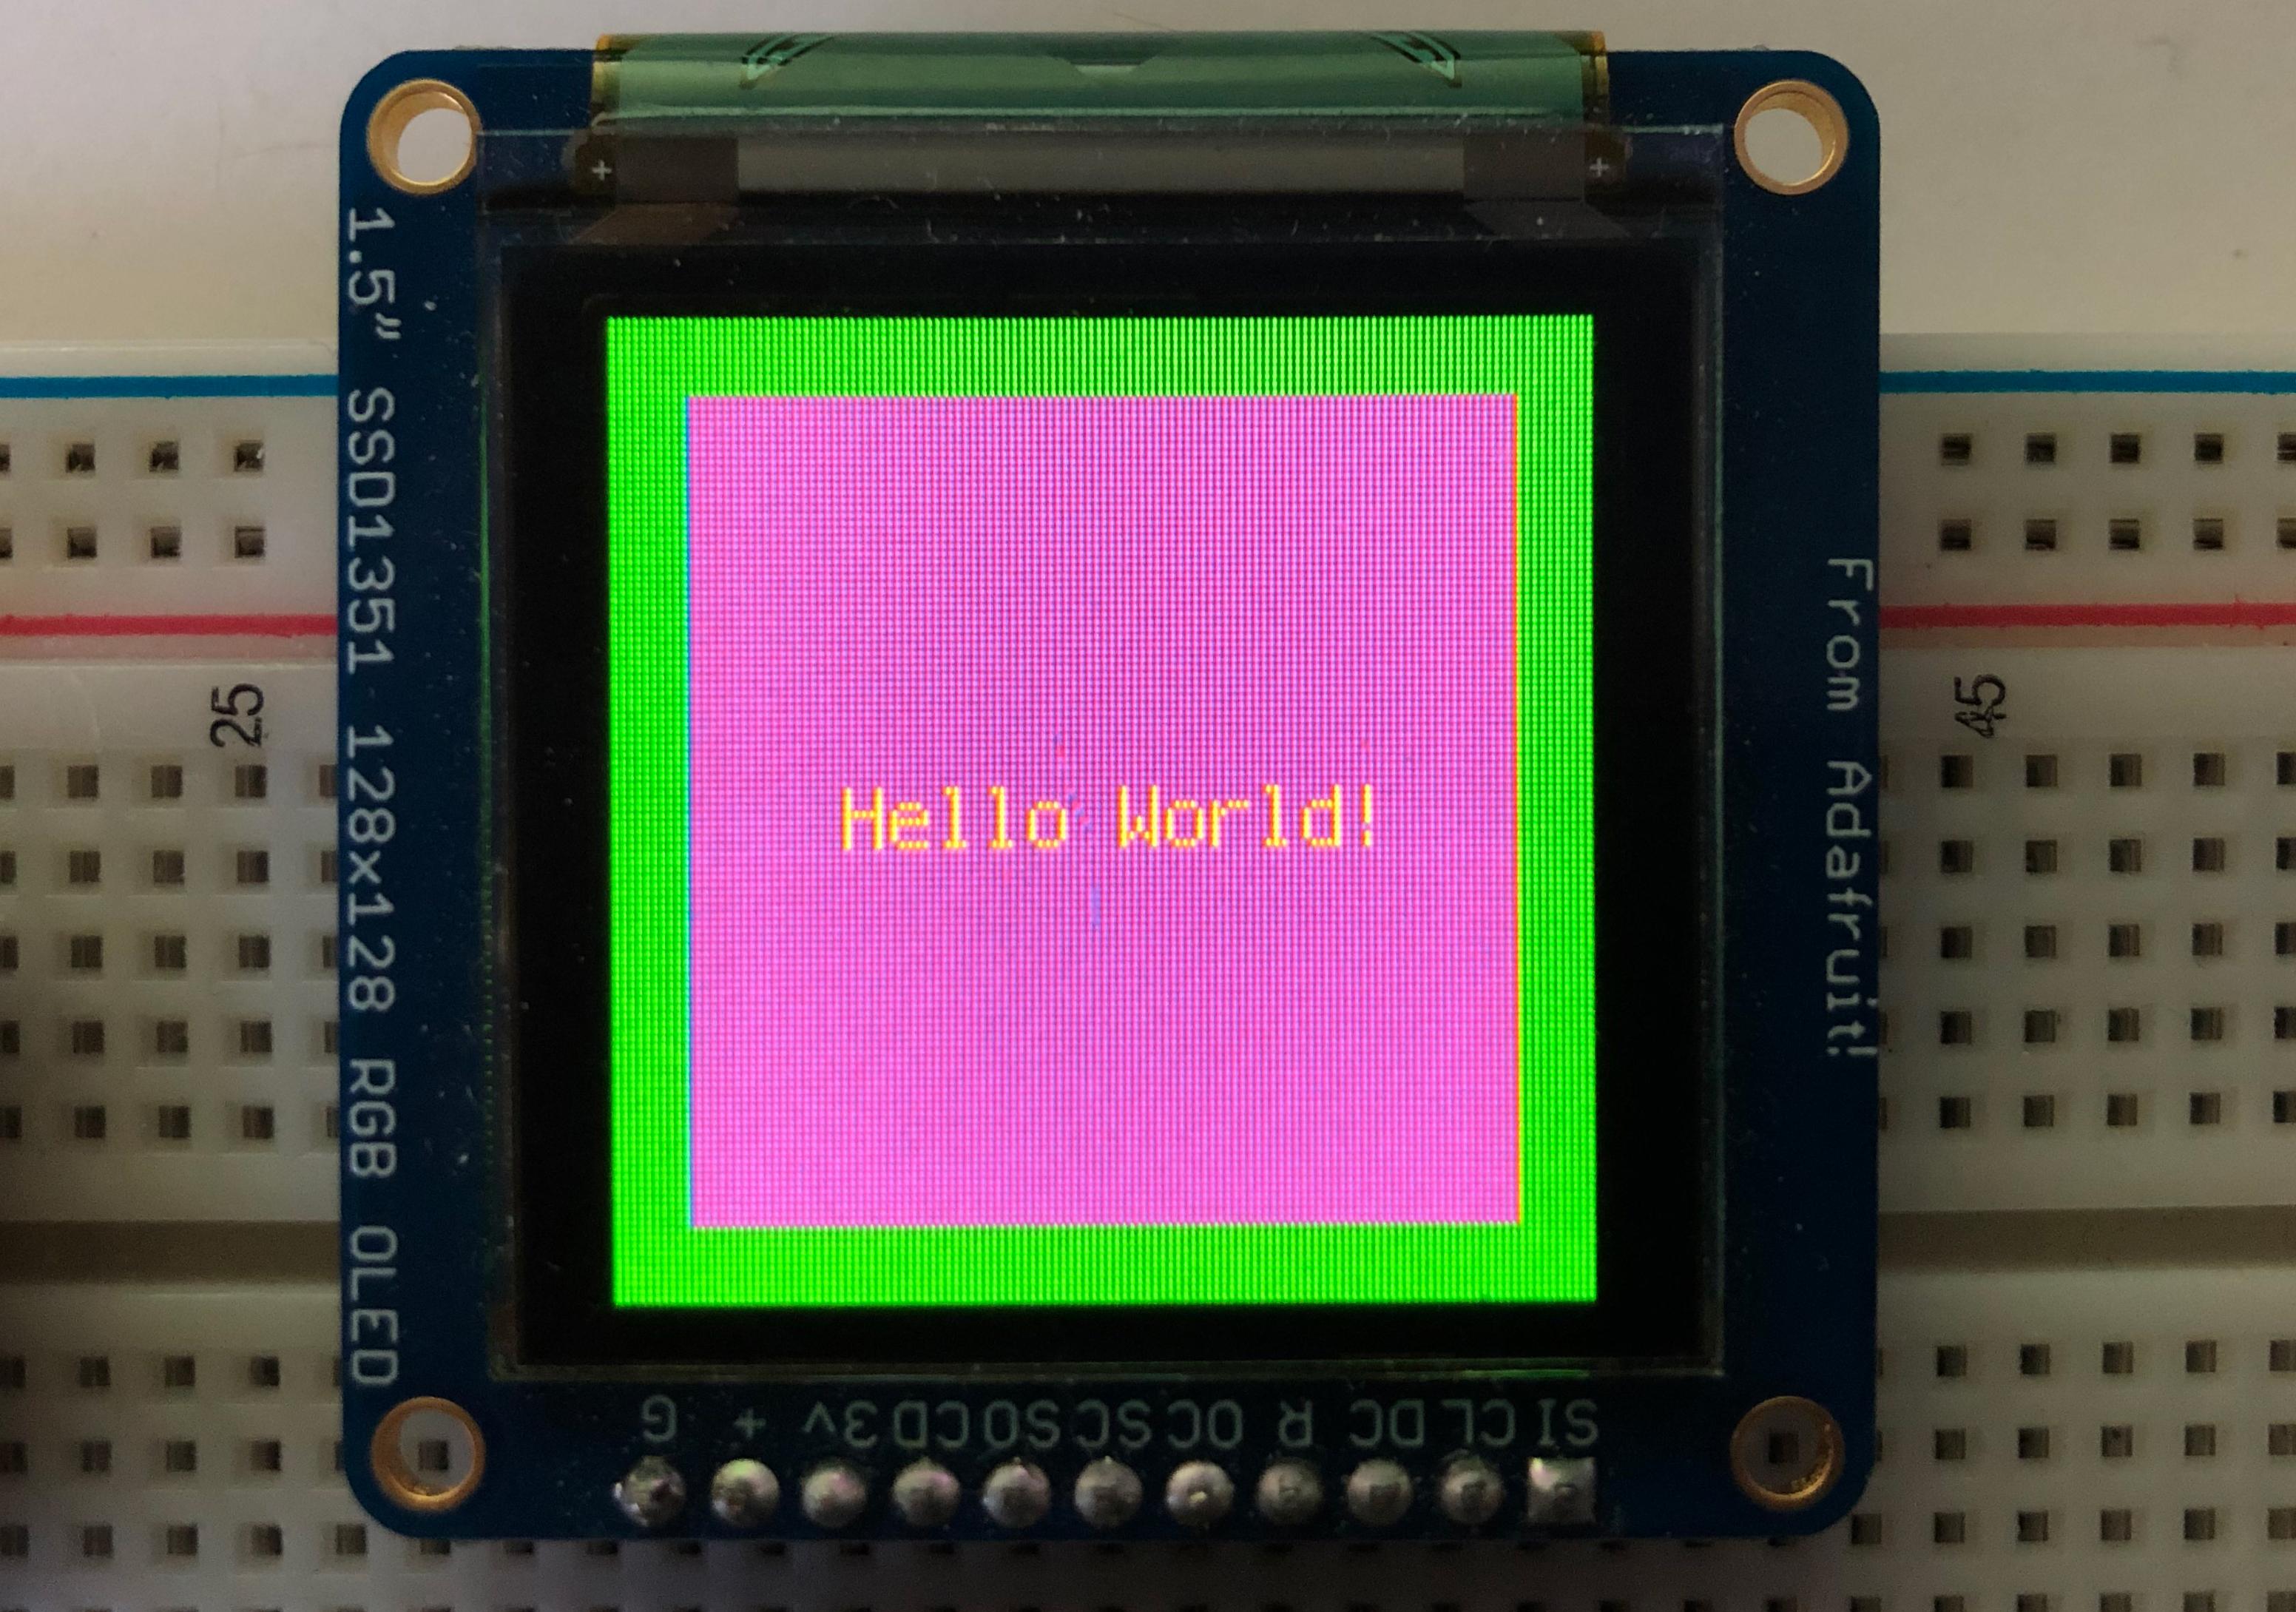 adafruit_products_ssd1351-hello-world.jpg